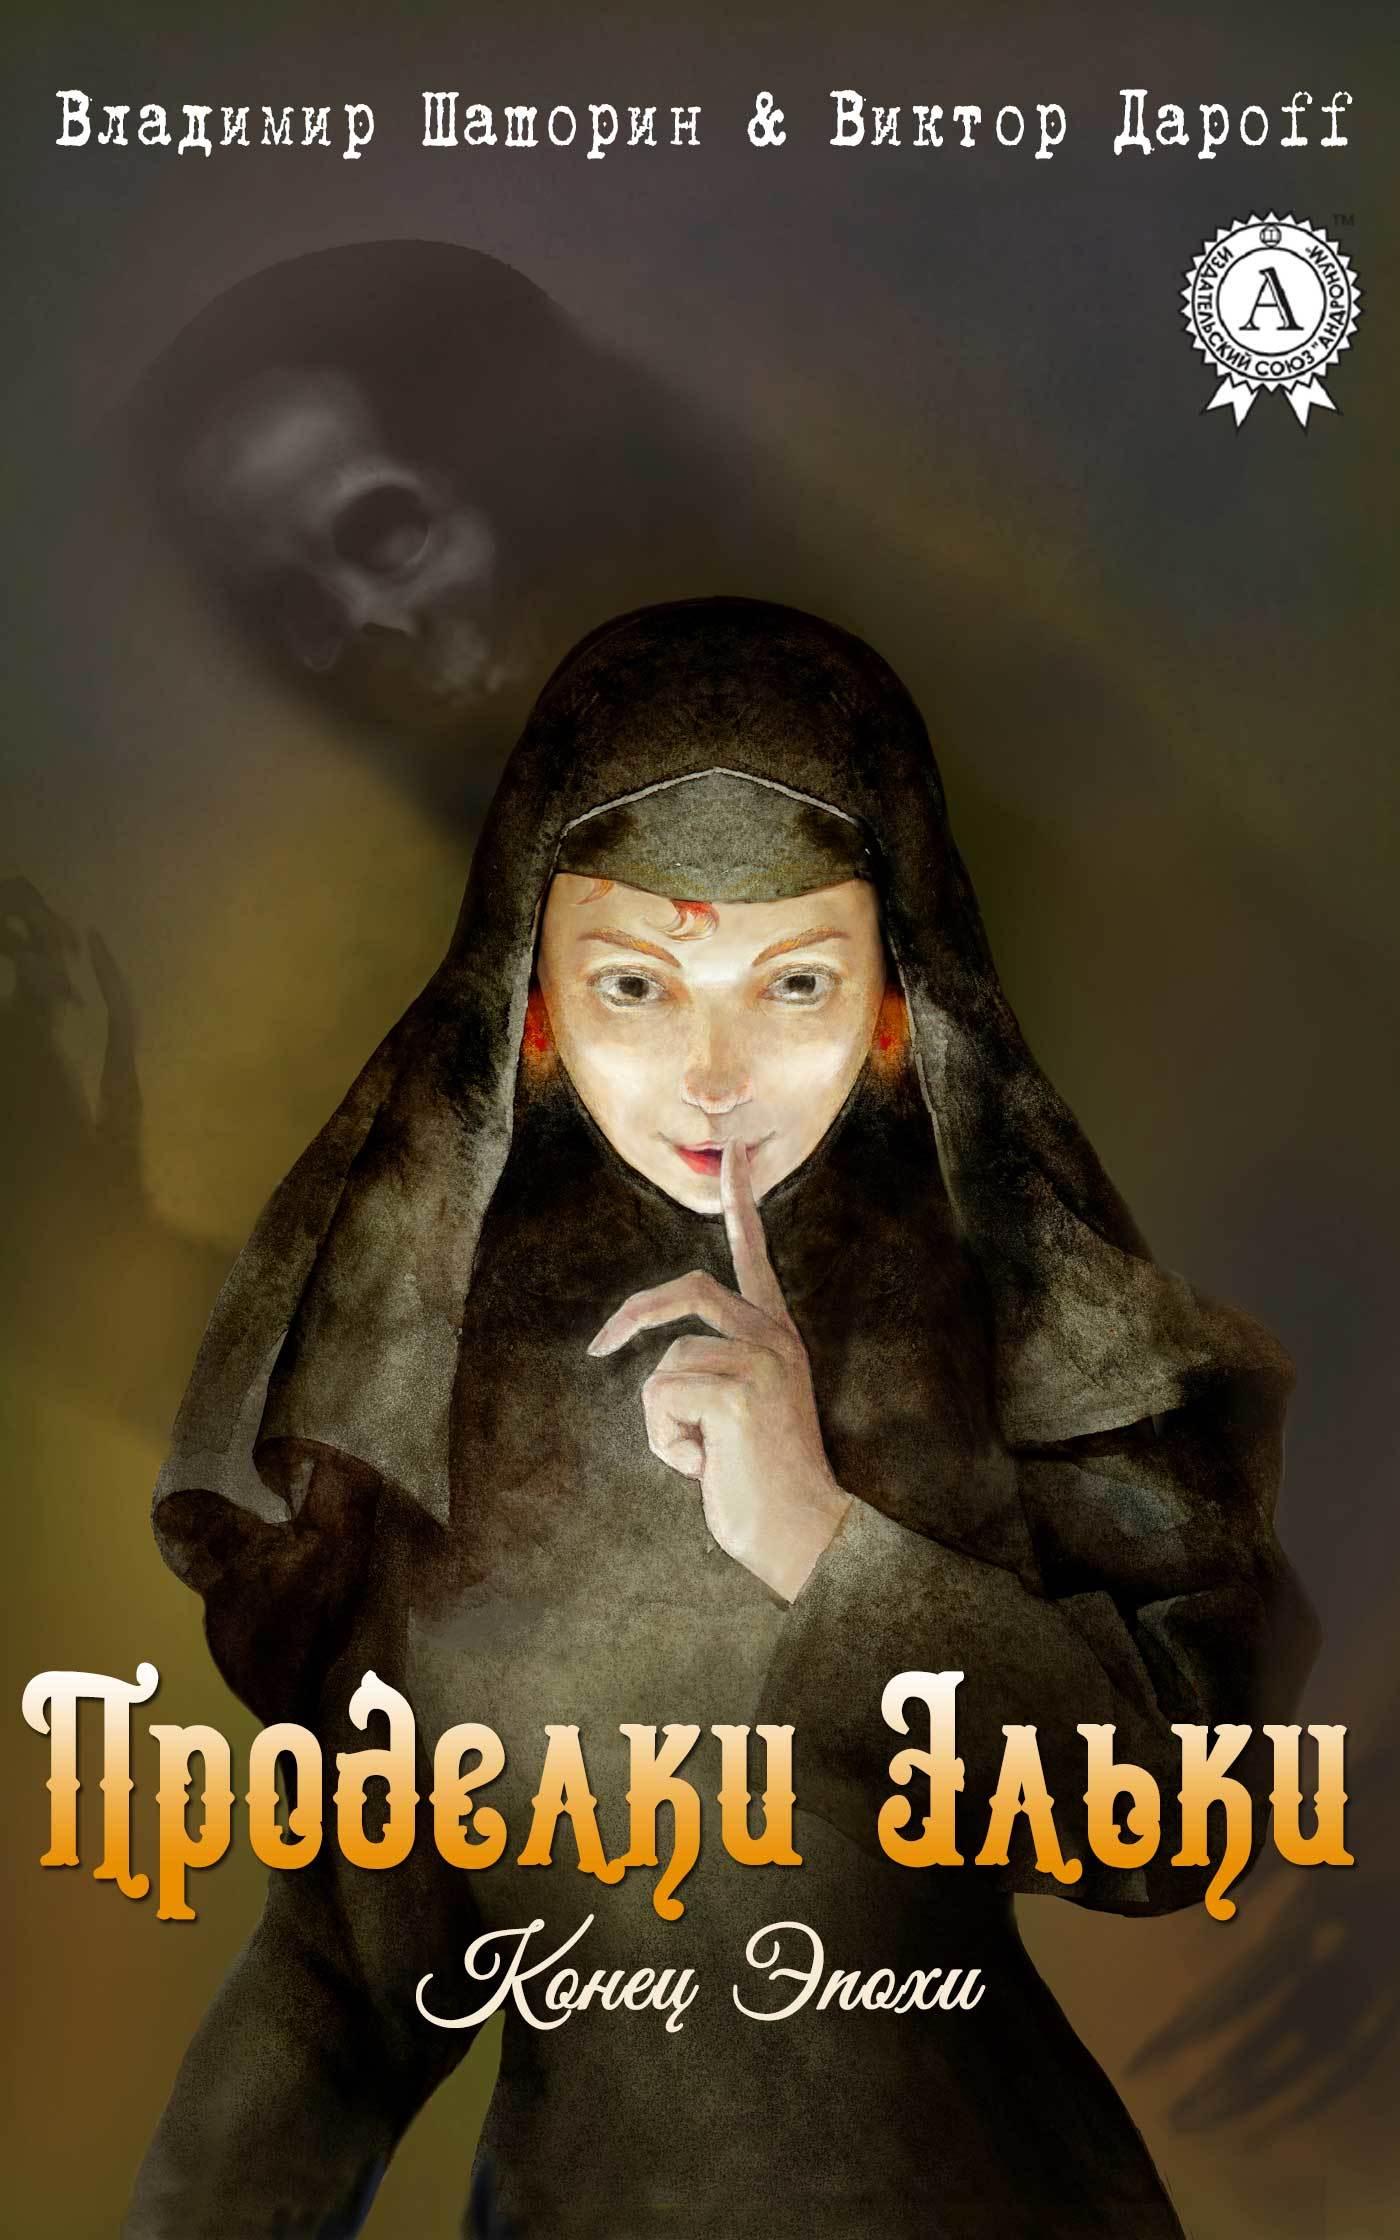 Владимир Шашорин, Виктор Дароff - Проделки Эльки